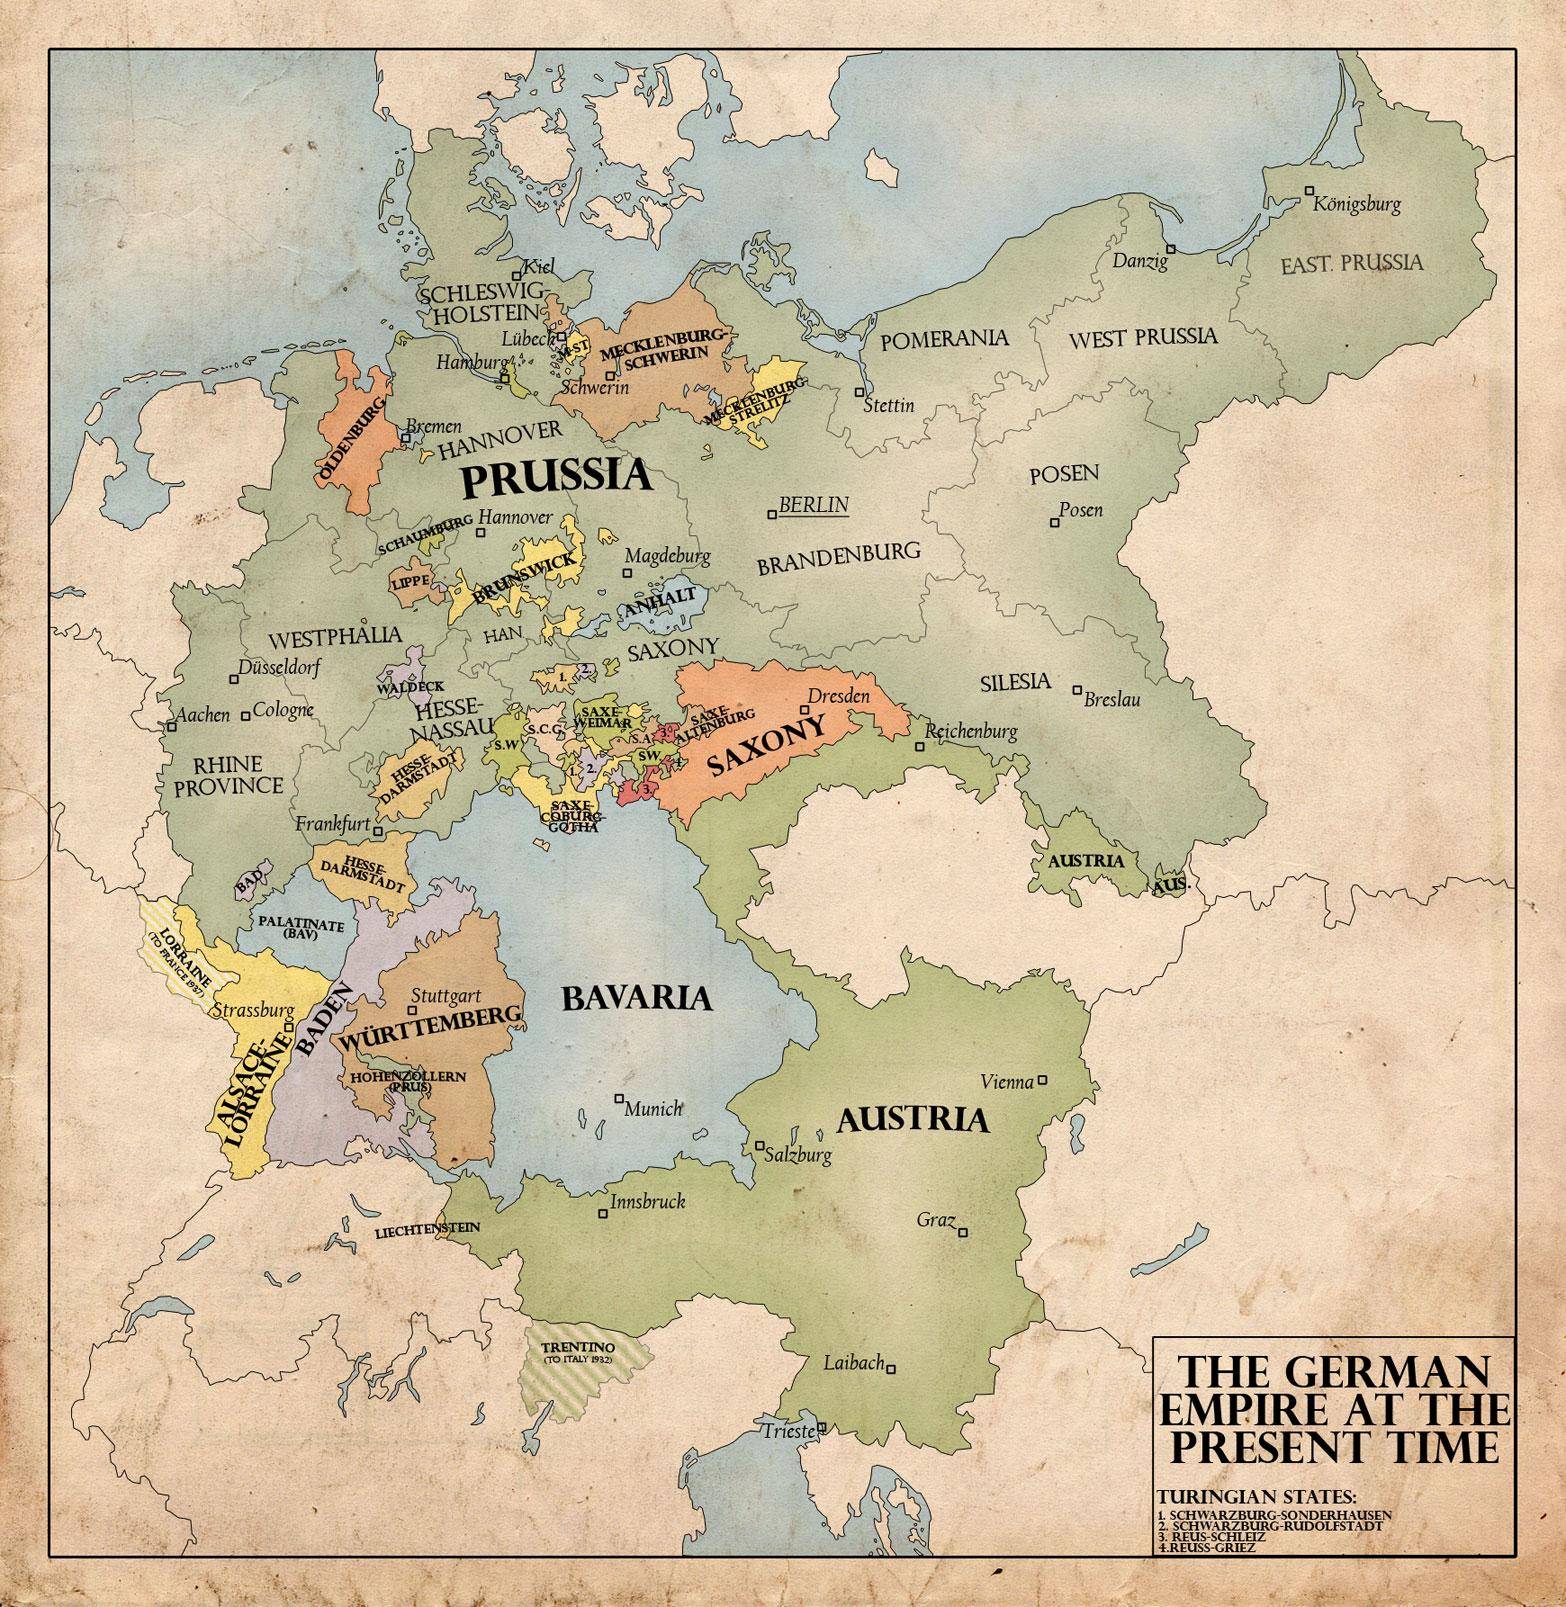 The_German_Empire__1940_by_edthomasten